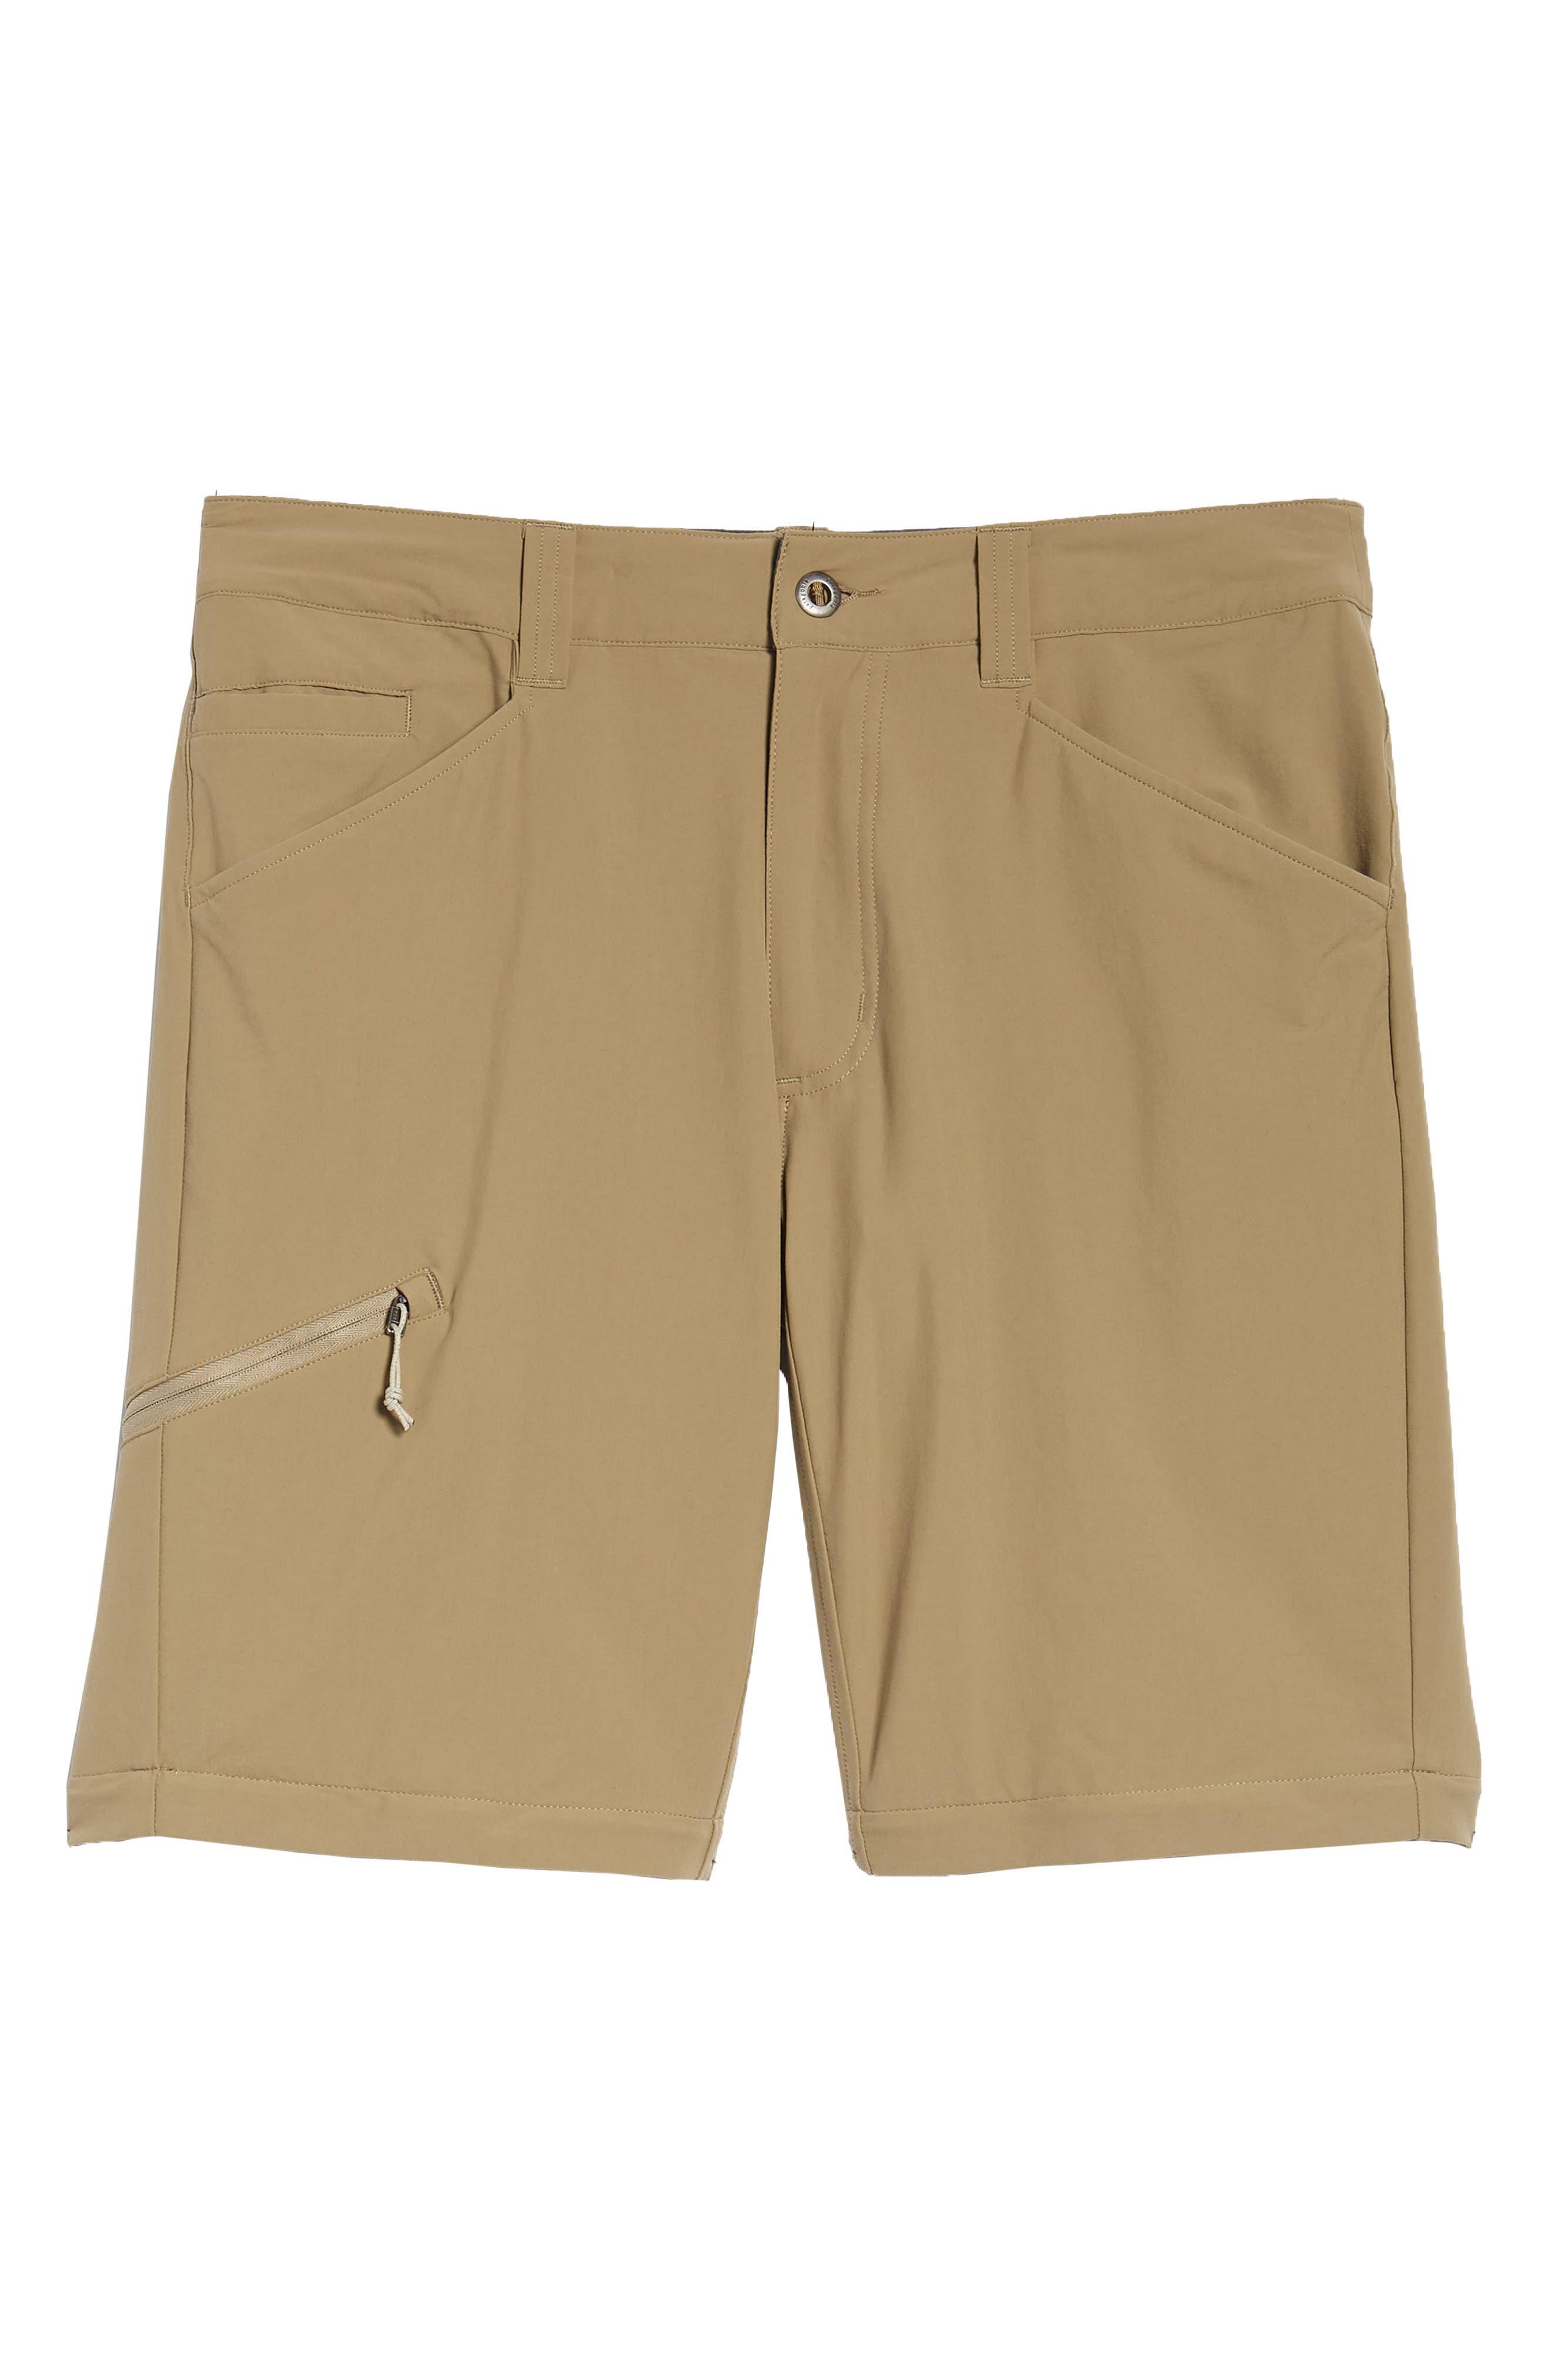 M's Quandry Convertible Pants,                             Alternate thumbnail 6, color,                             ASH TAN